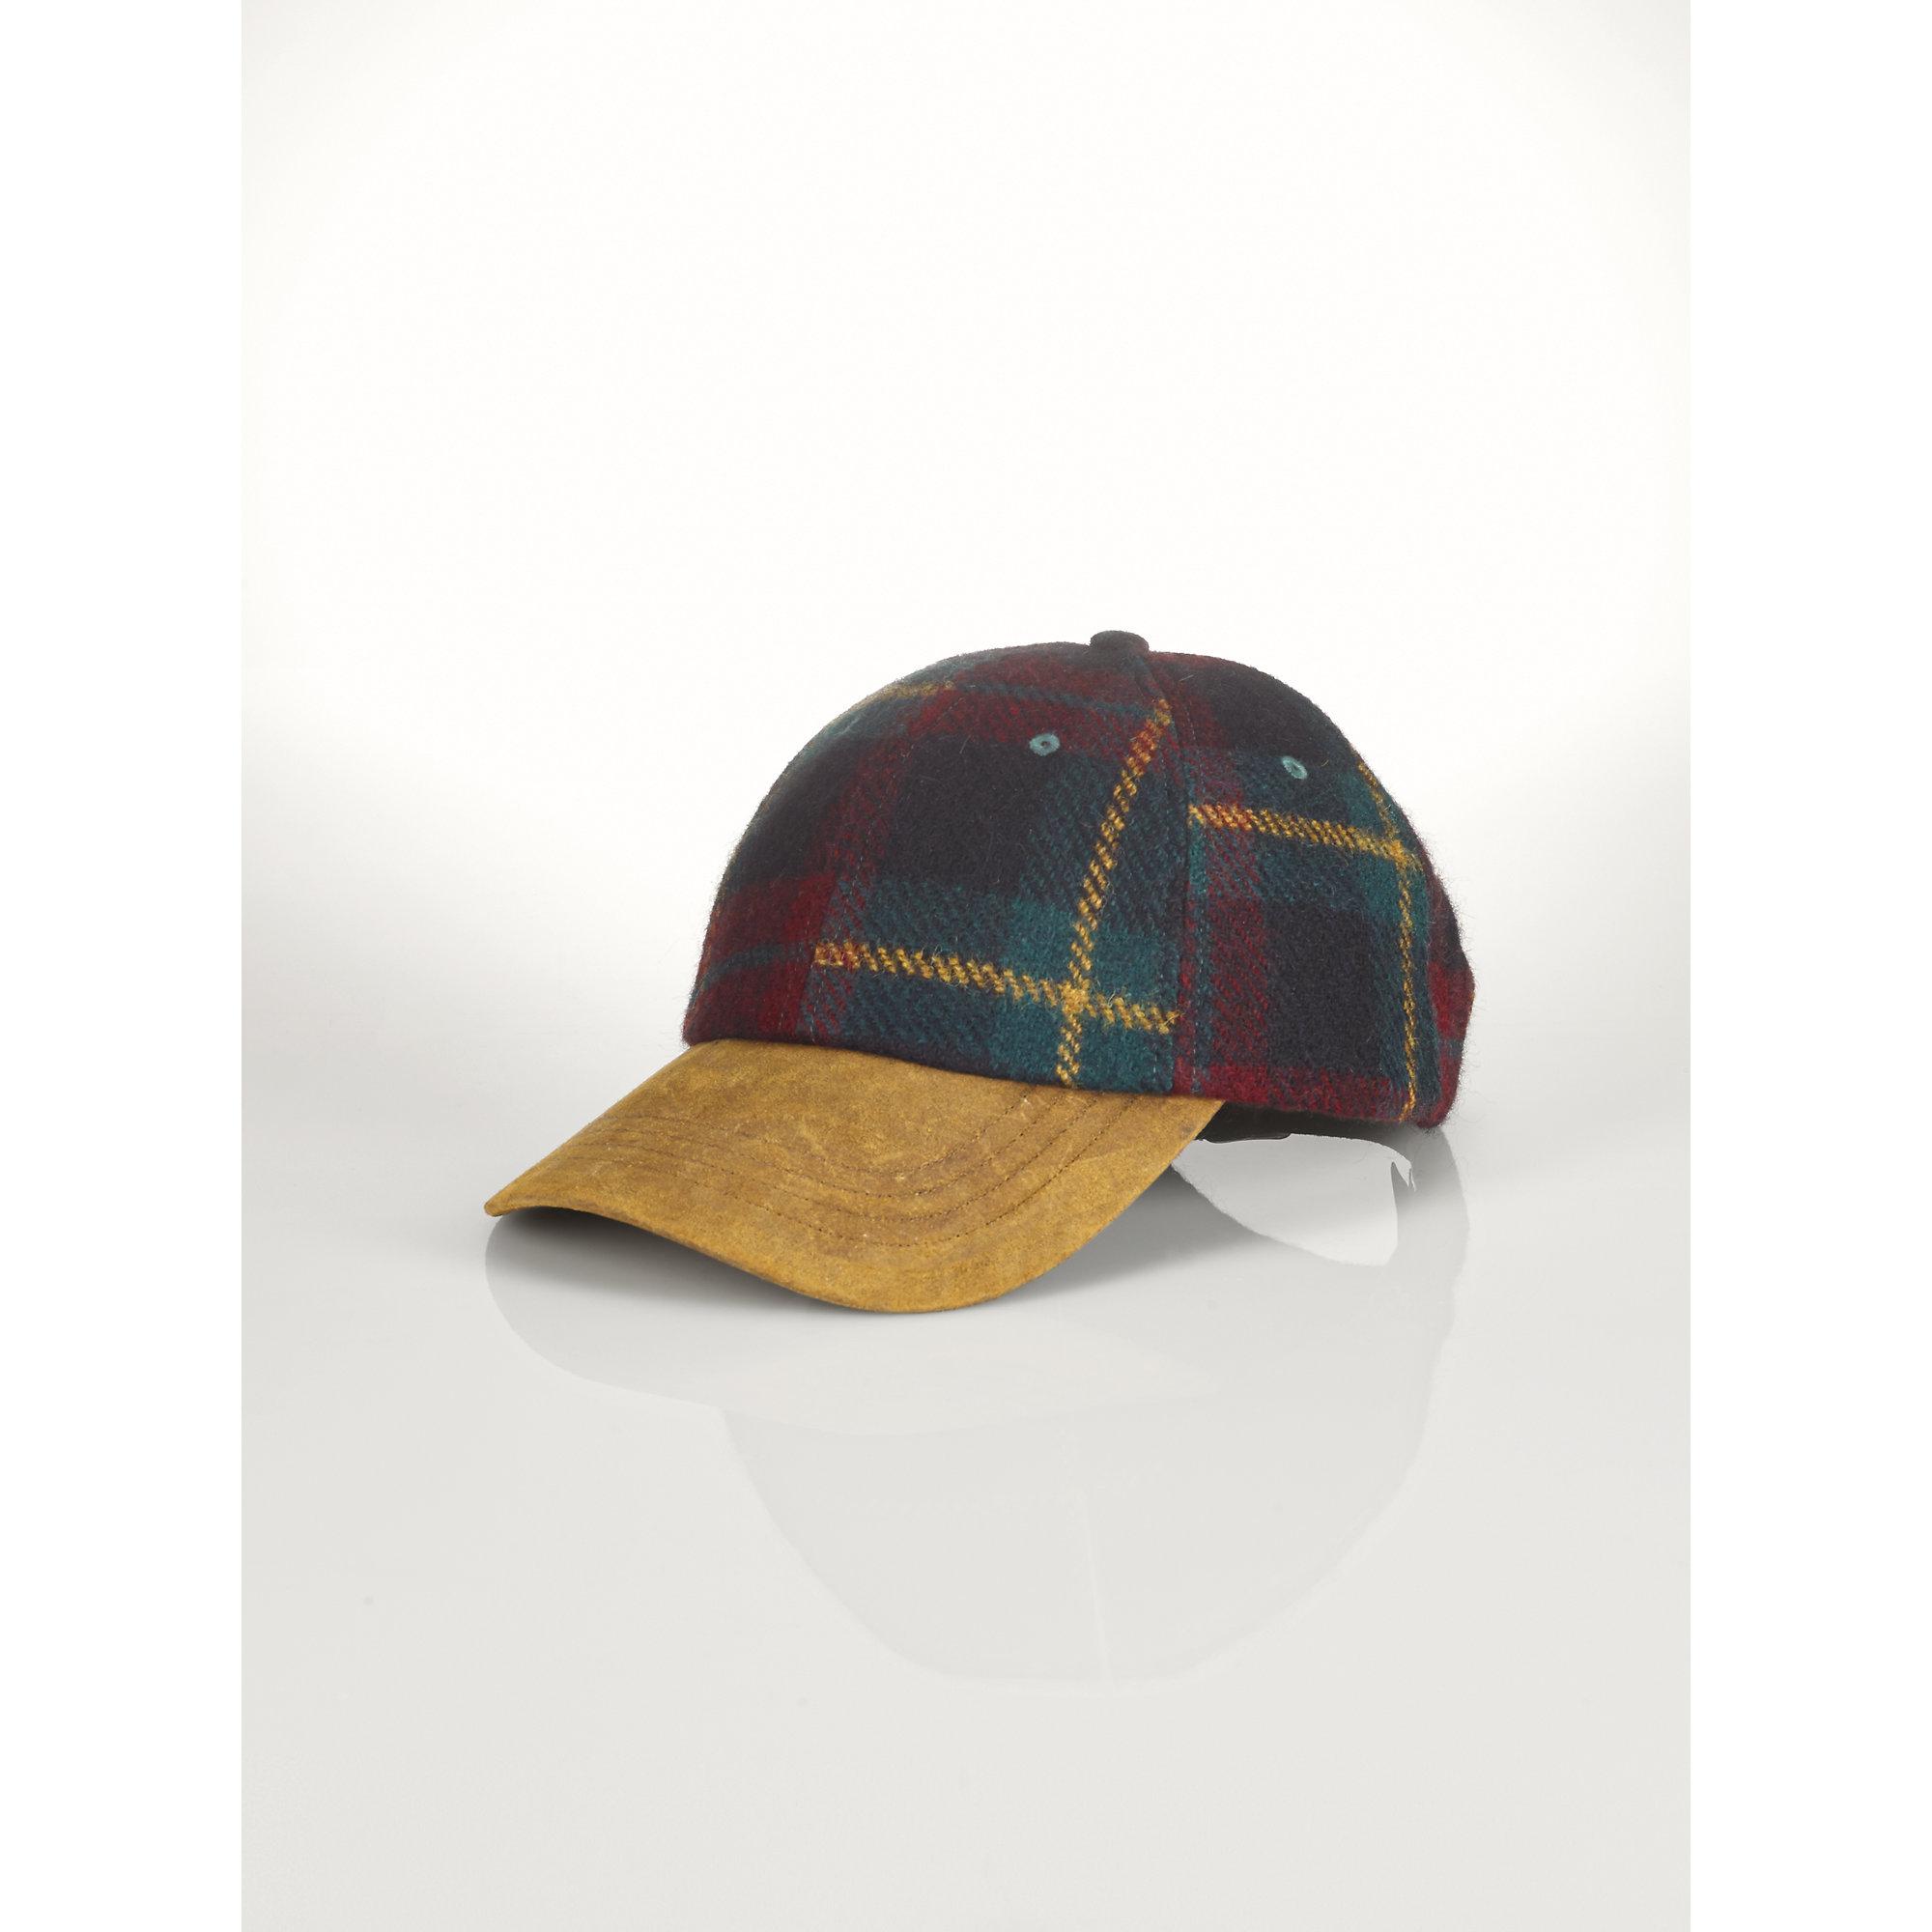 fa79969a4c22d Polo Ralph Lauren Plaid Wool Cap in Green for Men - Lyst